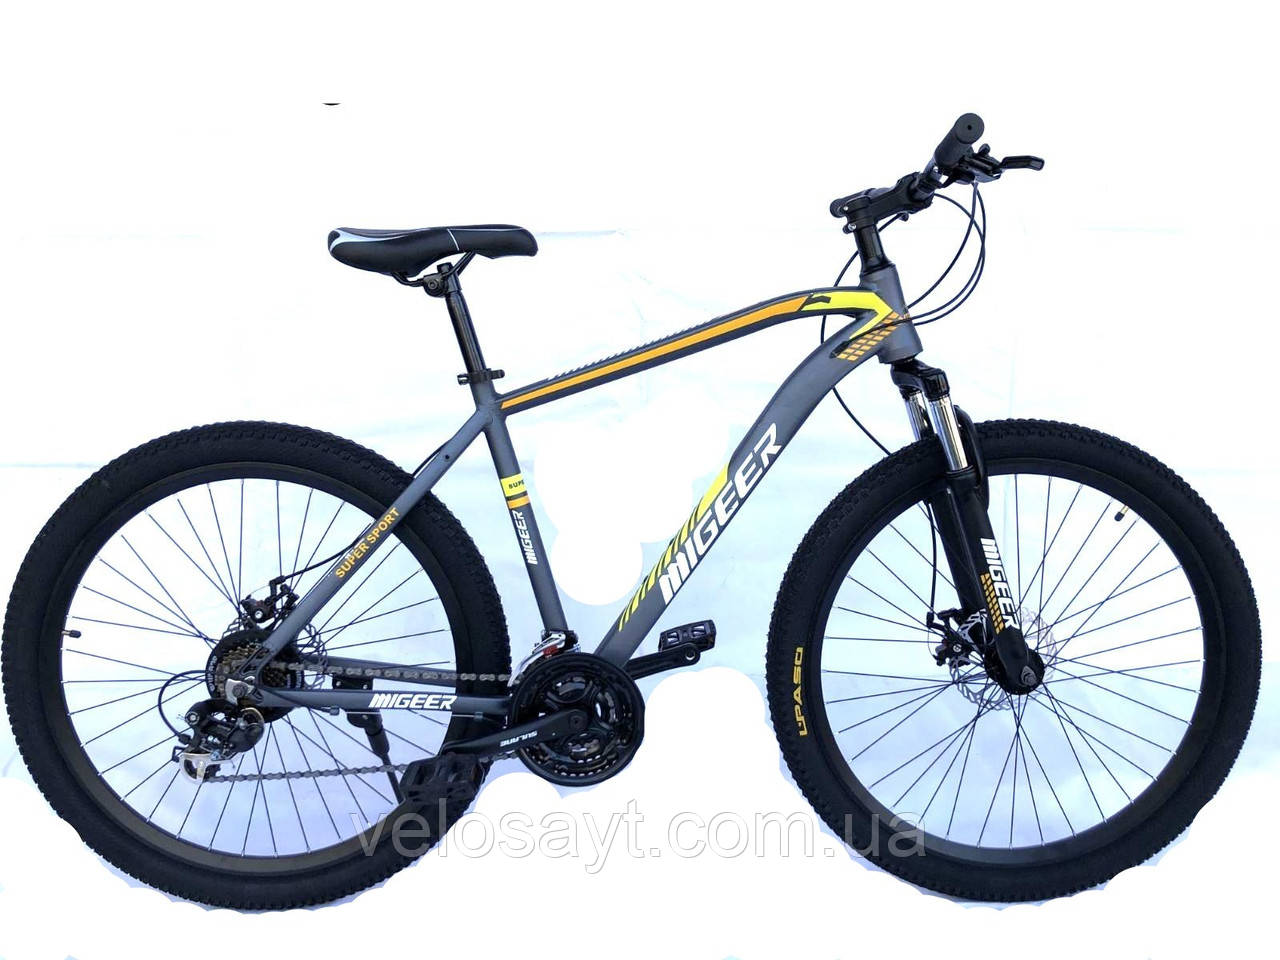 "Велосипед Unicorn - Migeer 27,5"" Размер рамы 18"" Алюминий 2020 год"